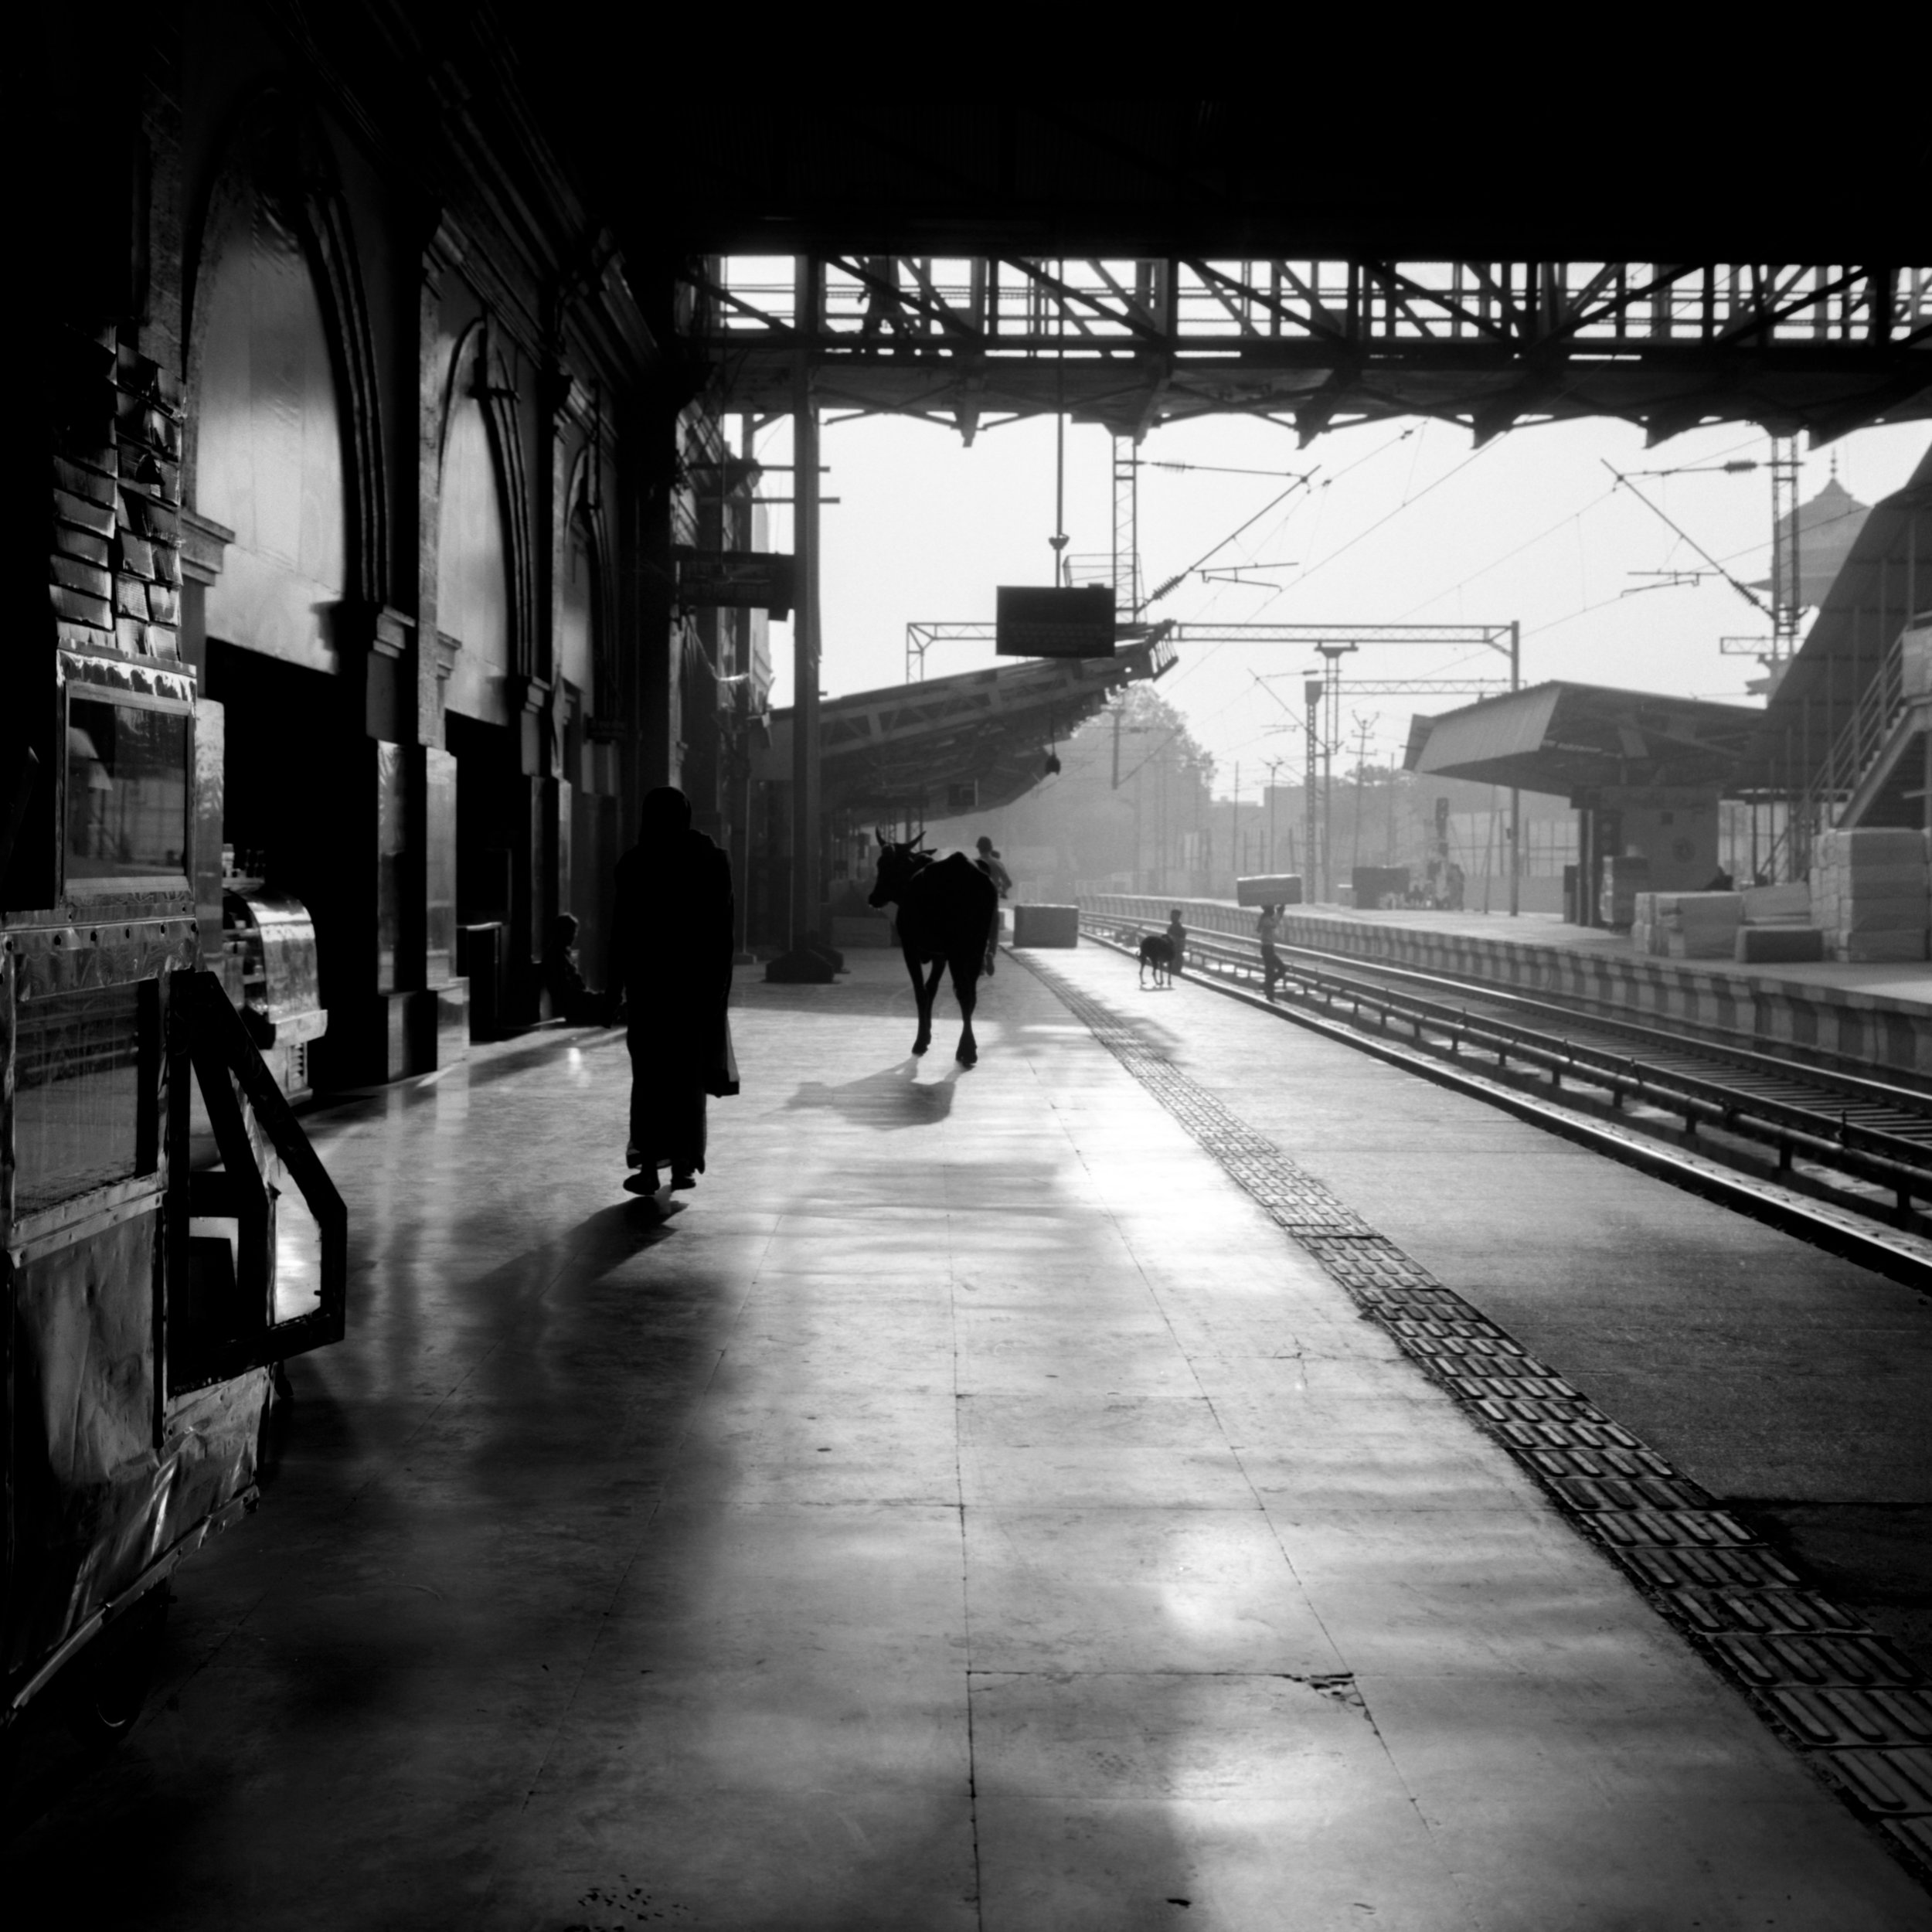 My train isn't here yet Rolleiflex 2.8D | Ilford HP5